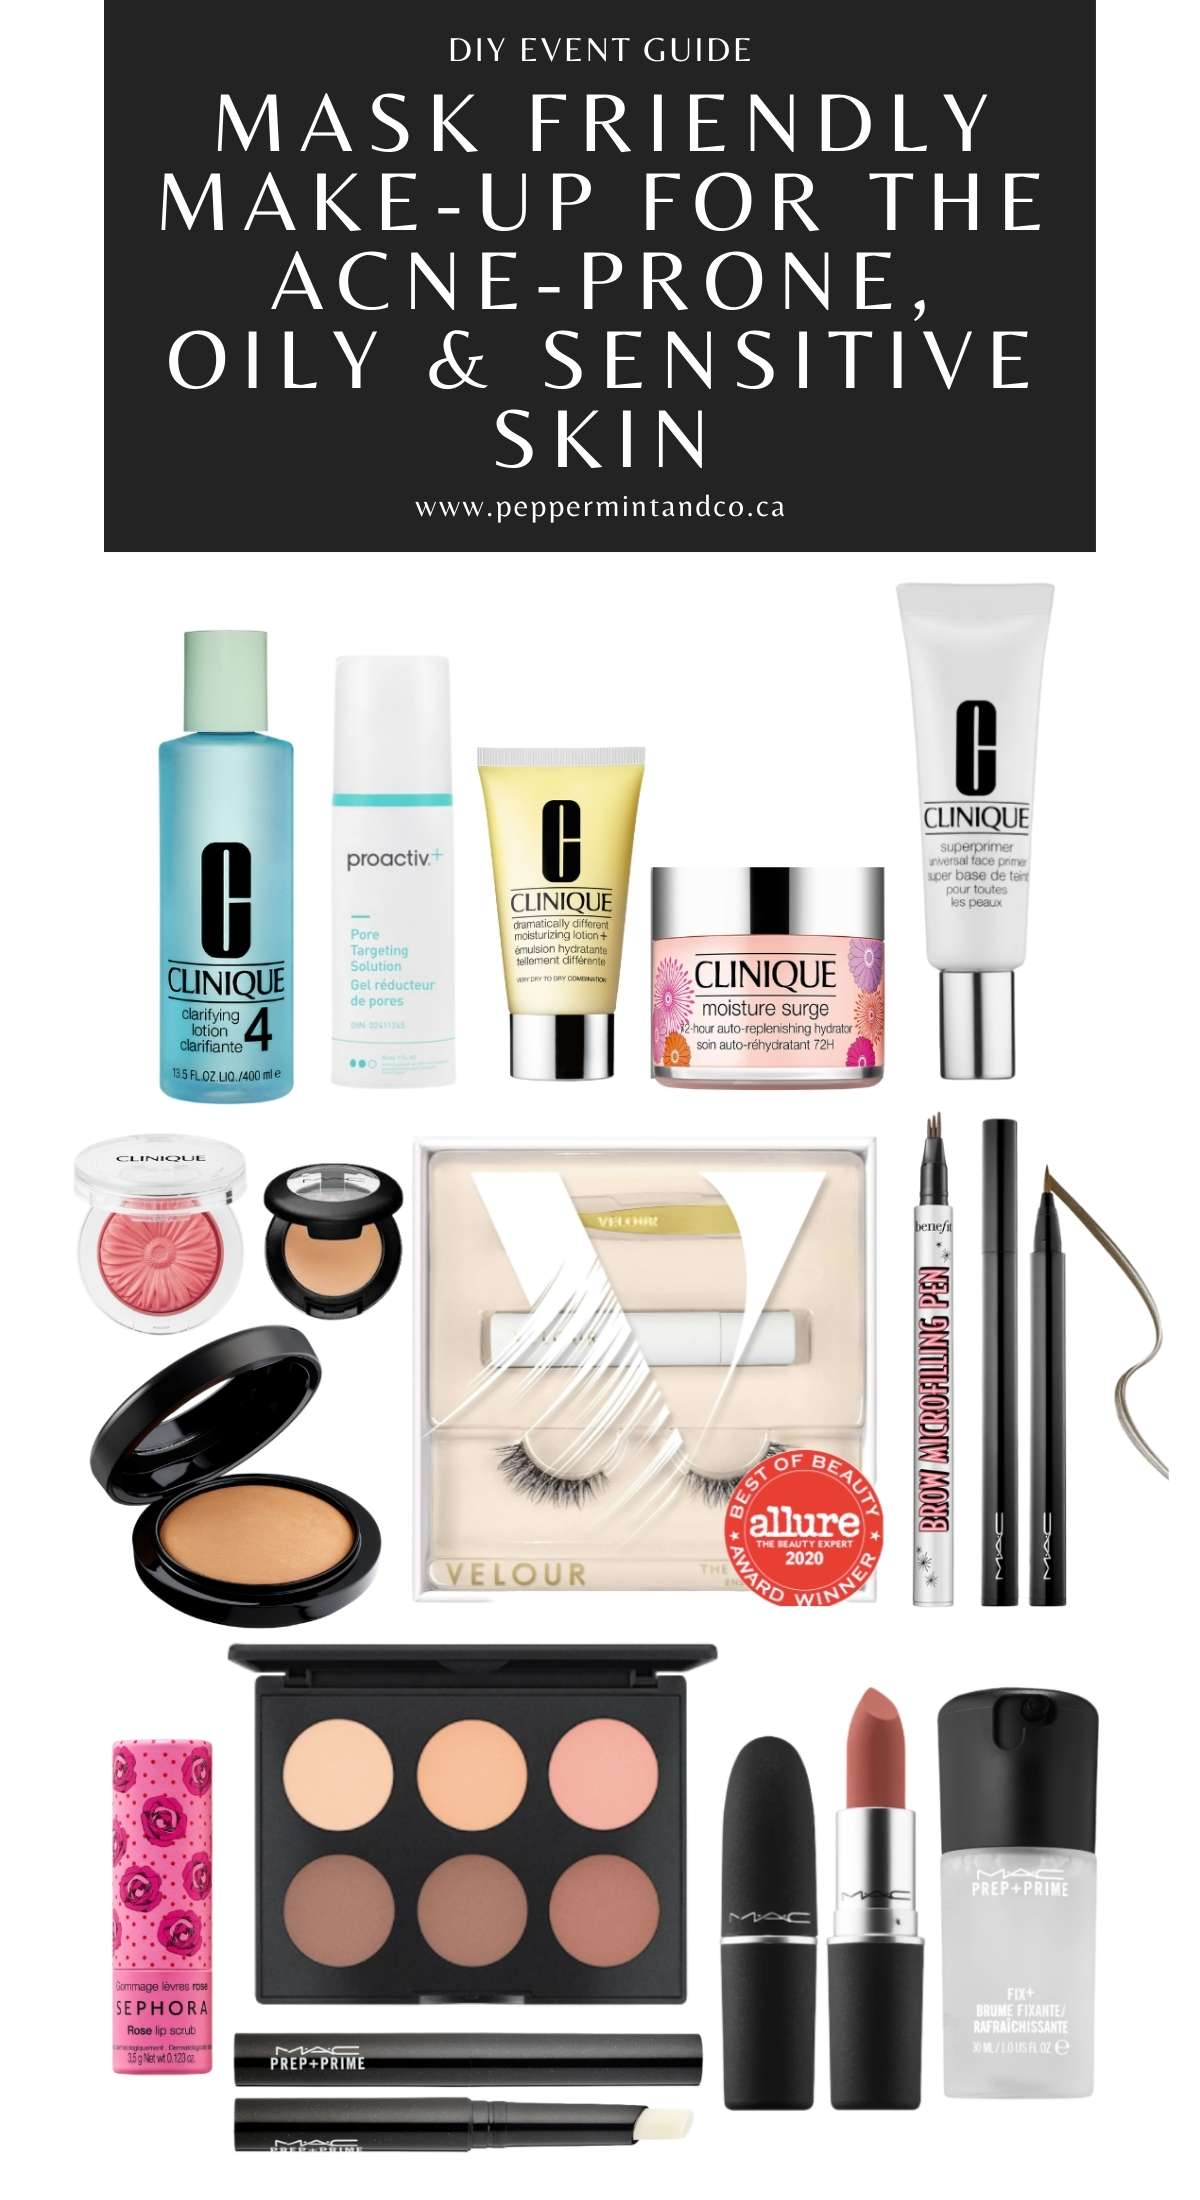 Wedding Makeup Tips: Wearing Mask, Acne-Prone, Oily, Sensitive Skin